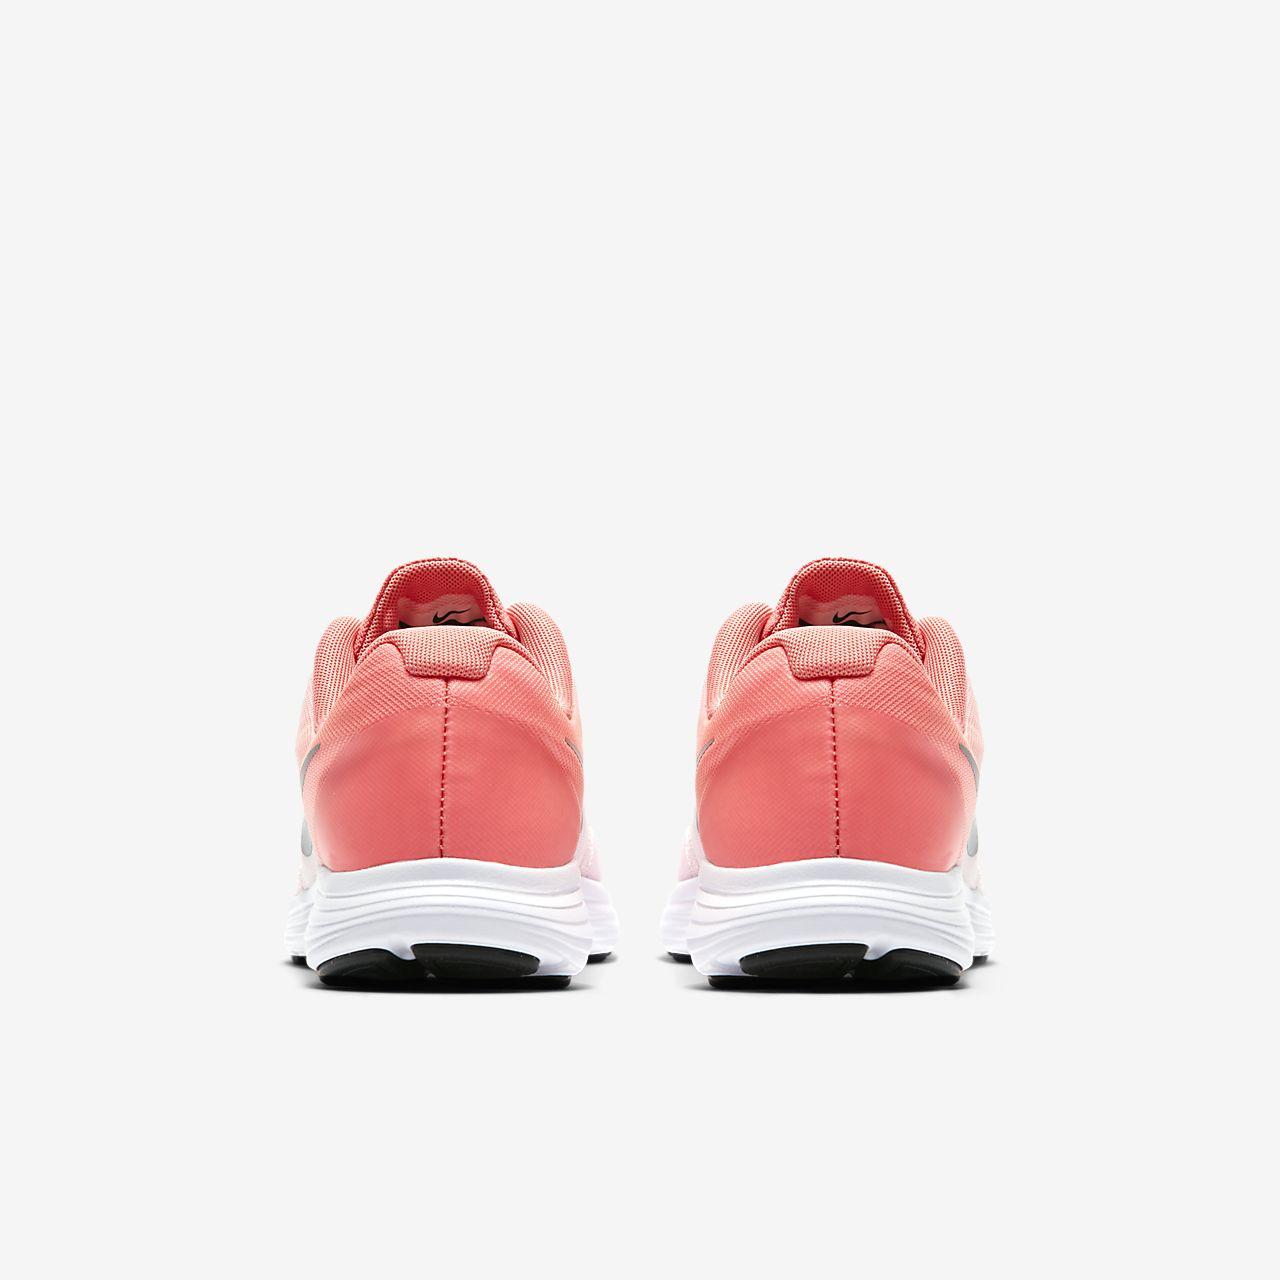 684c9d2c80 Nike Revolution 3 Older Kids' Running Shoe. Nike.com GB